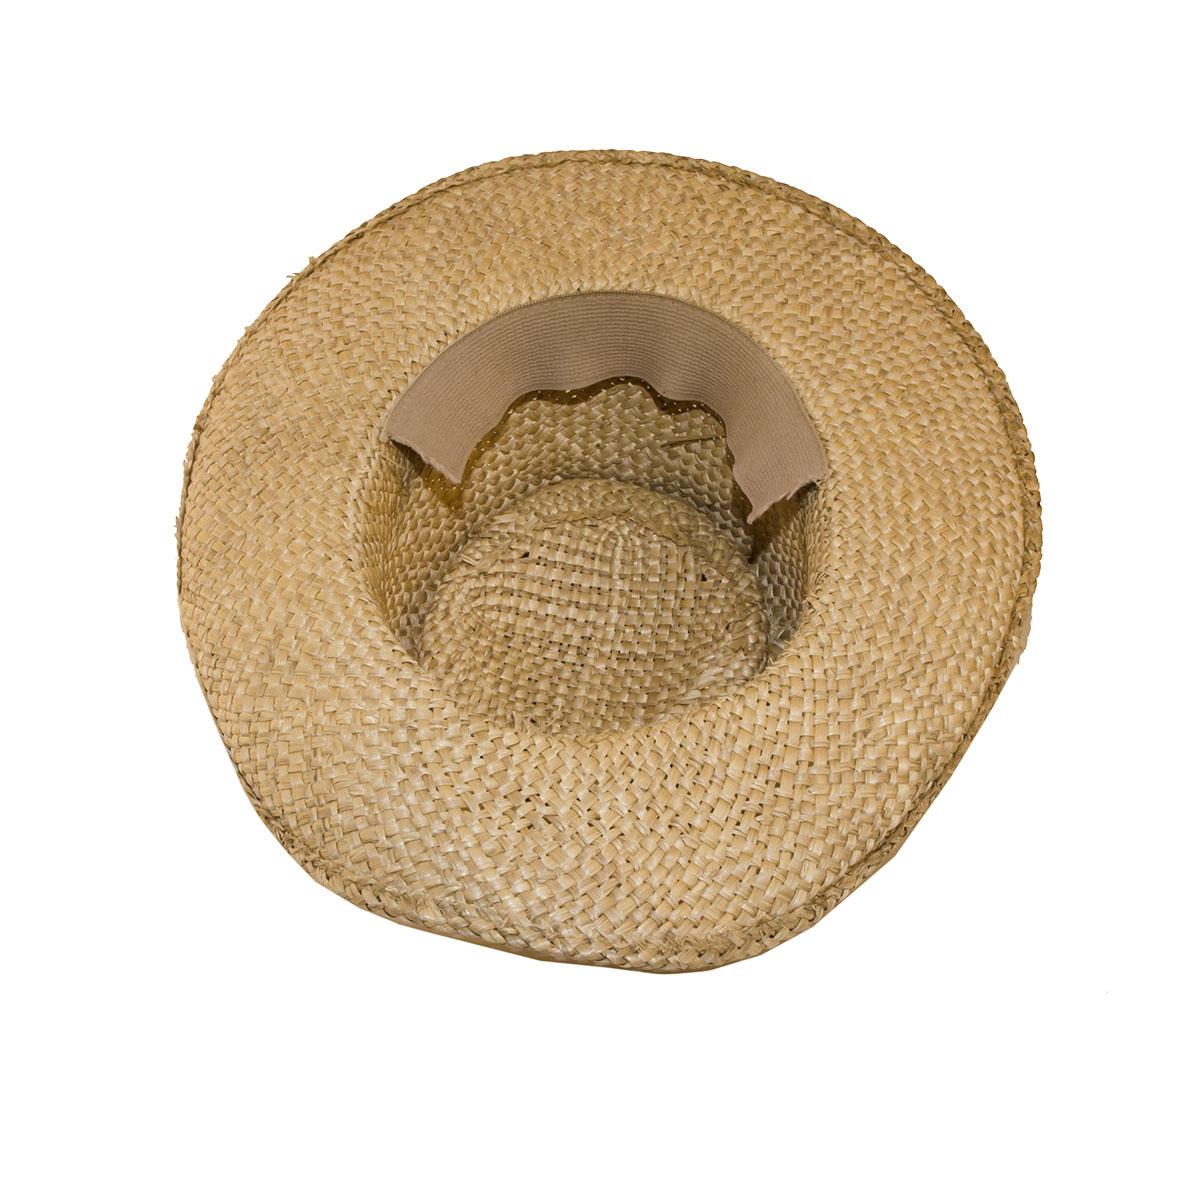 mens floppy sun hats